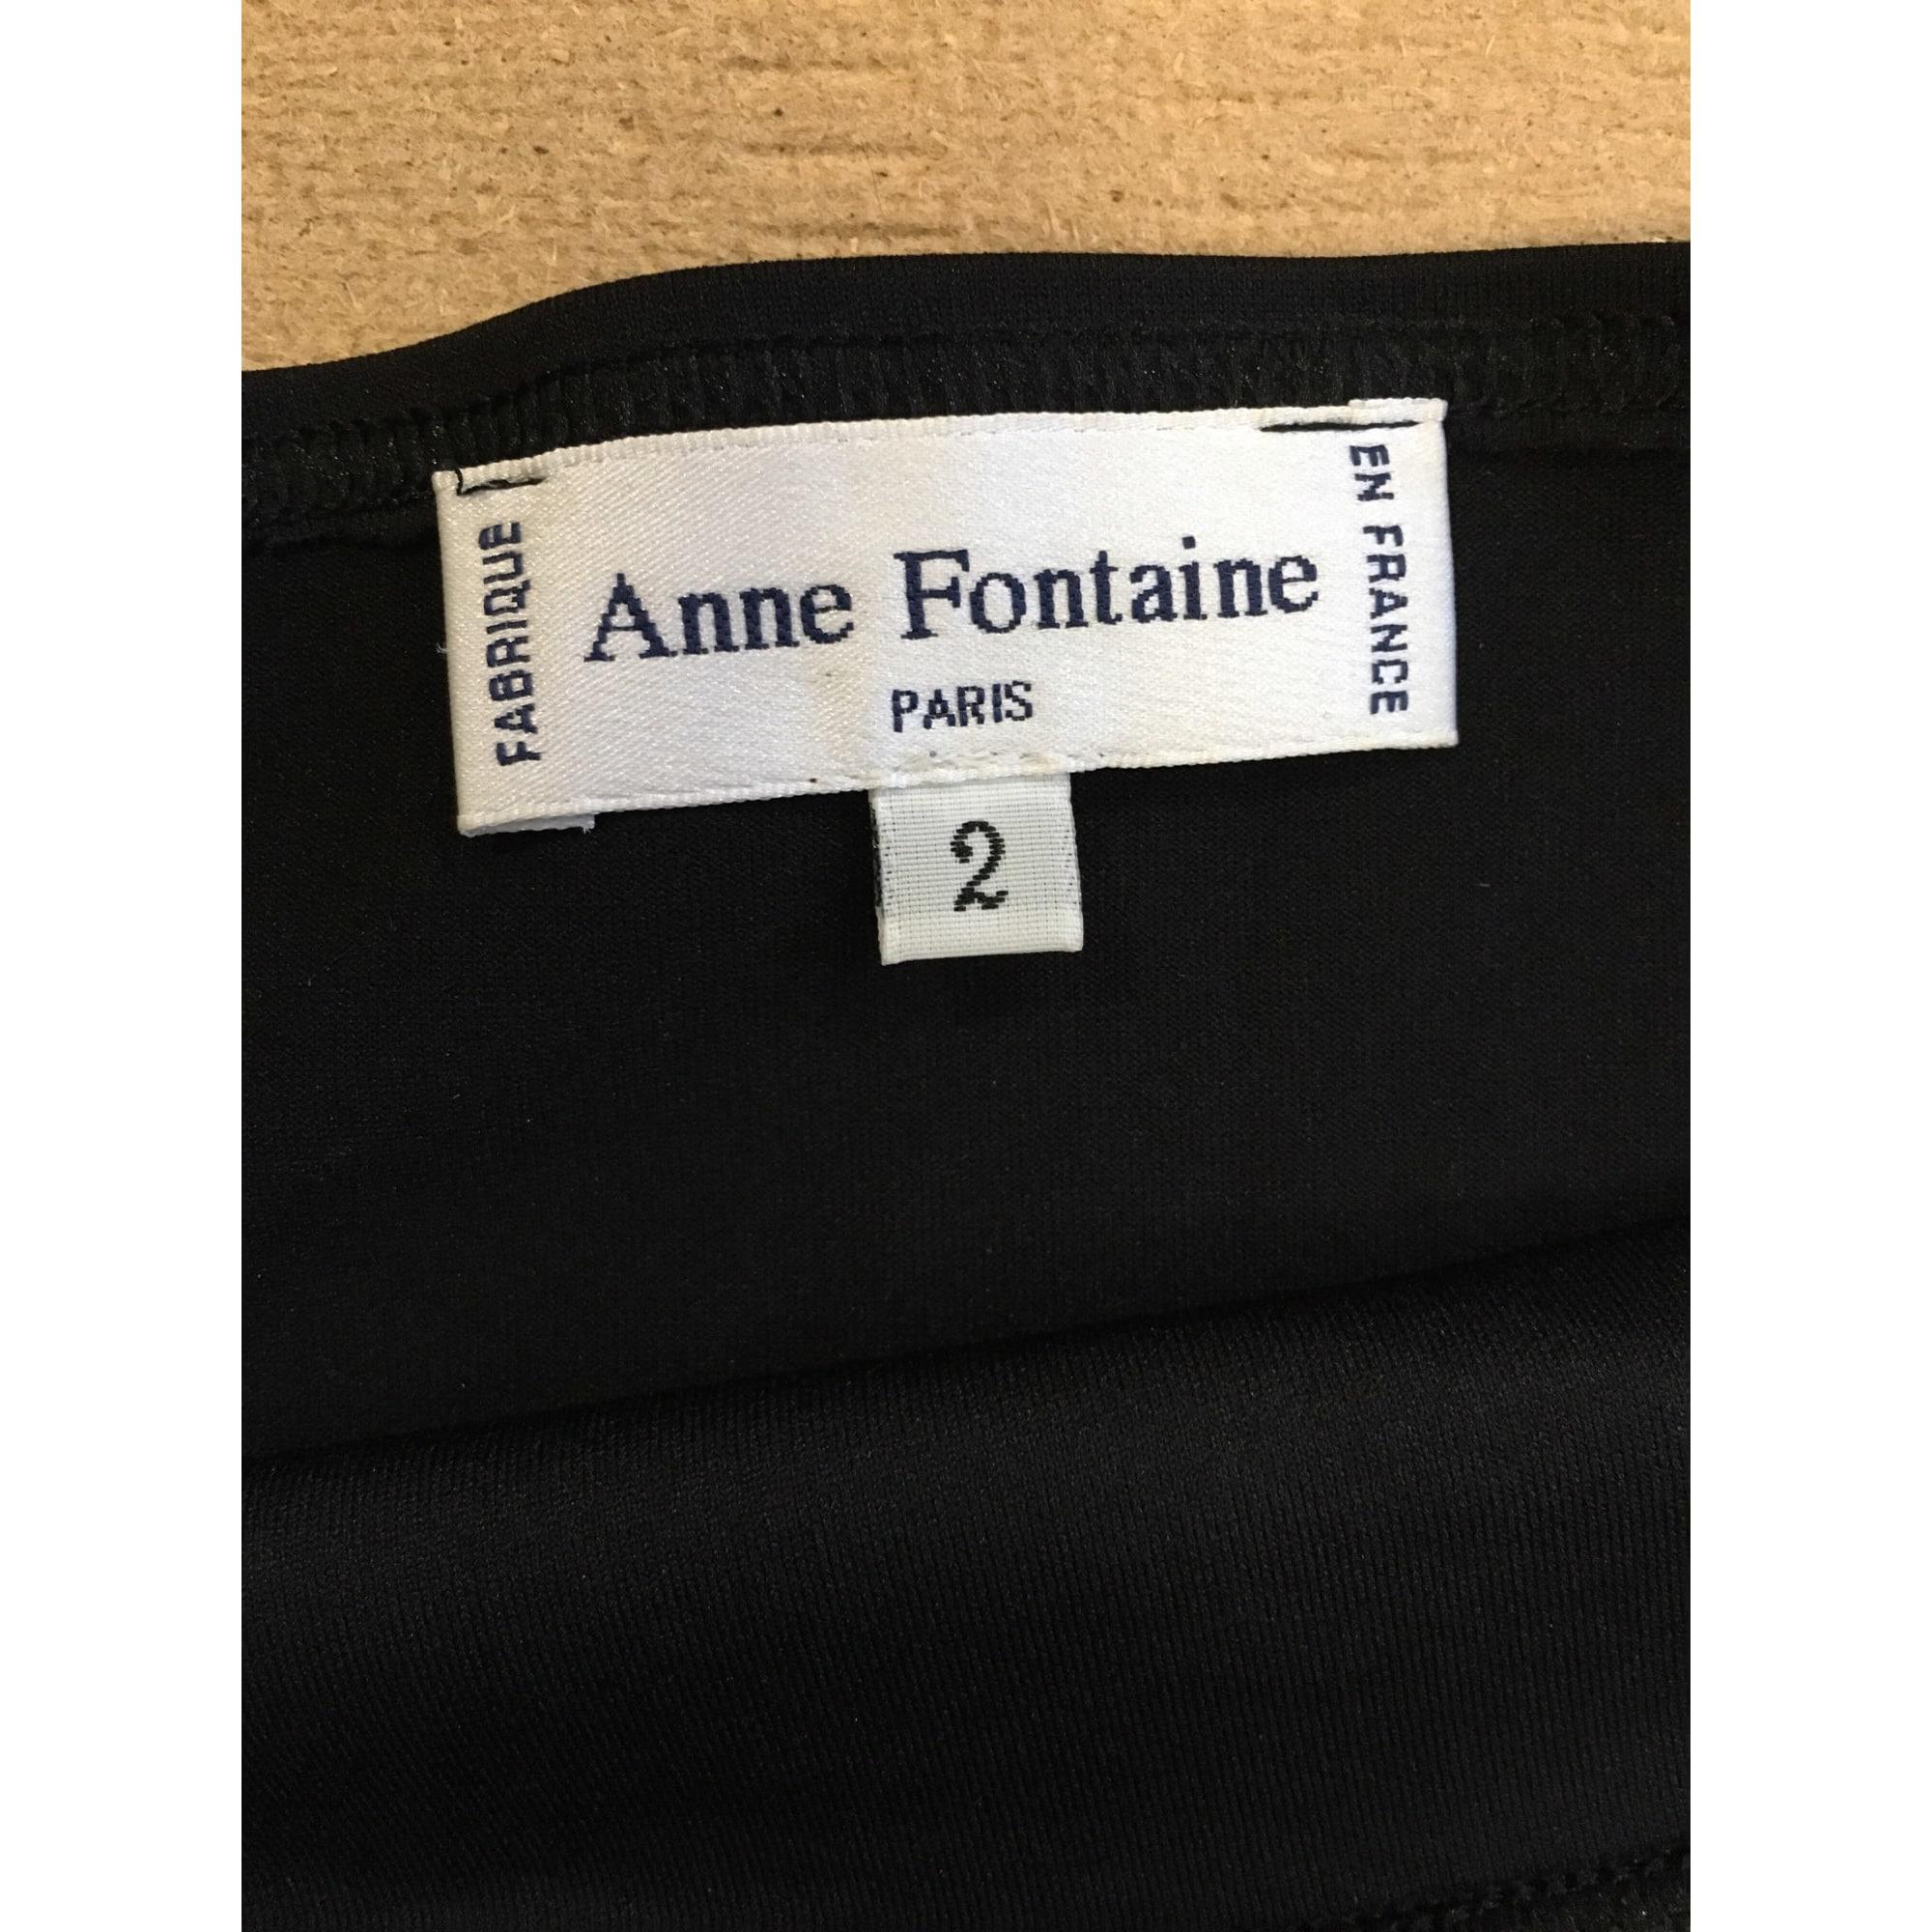 Bustier ANNE FONTAINE Noir